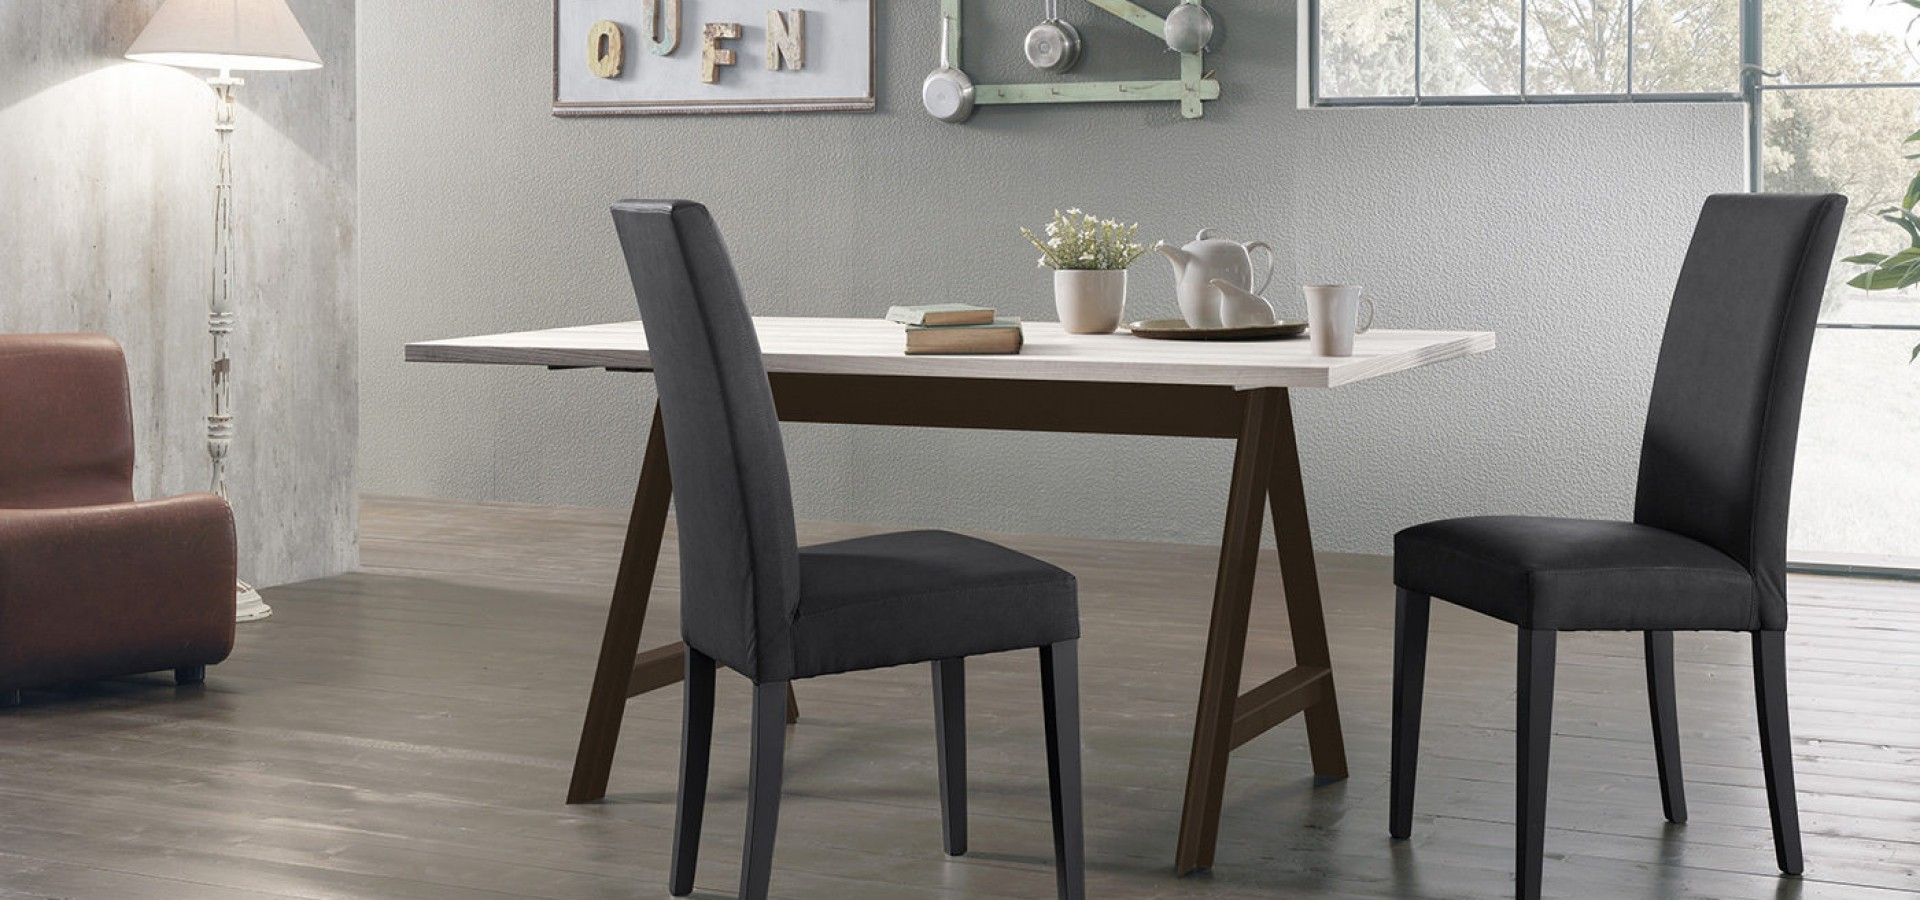 Итальянский стол FLY tavolo |